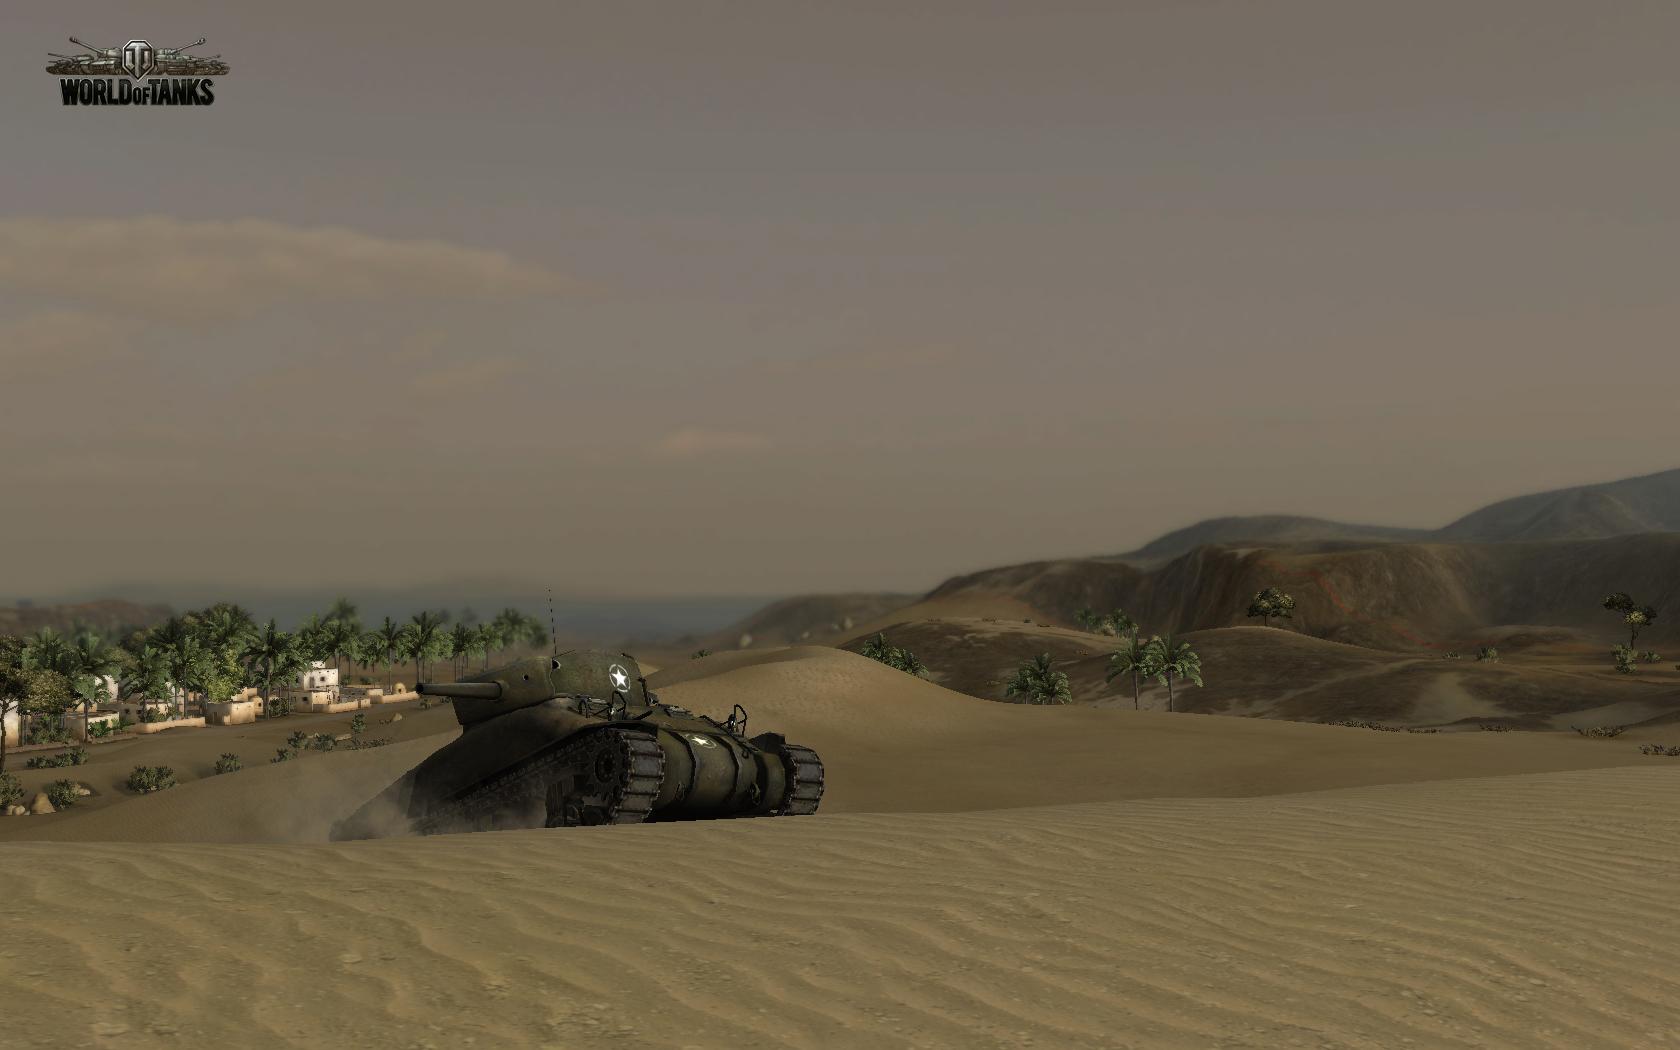 Click image for larger version.Name:World of Tanks 34.jpgViews:204Size:651.1 KBID:1619